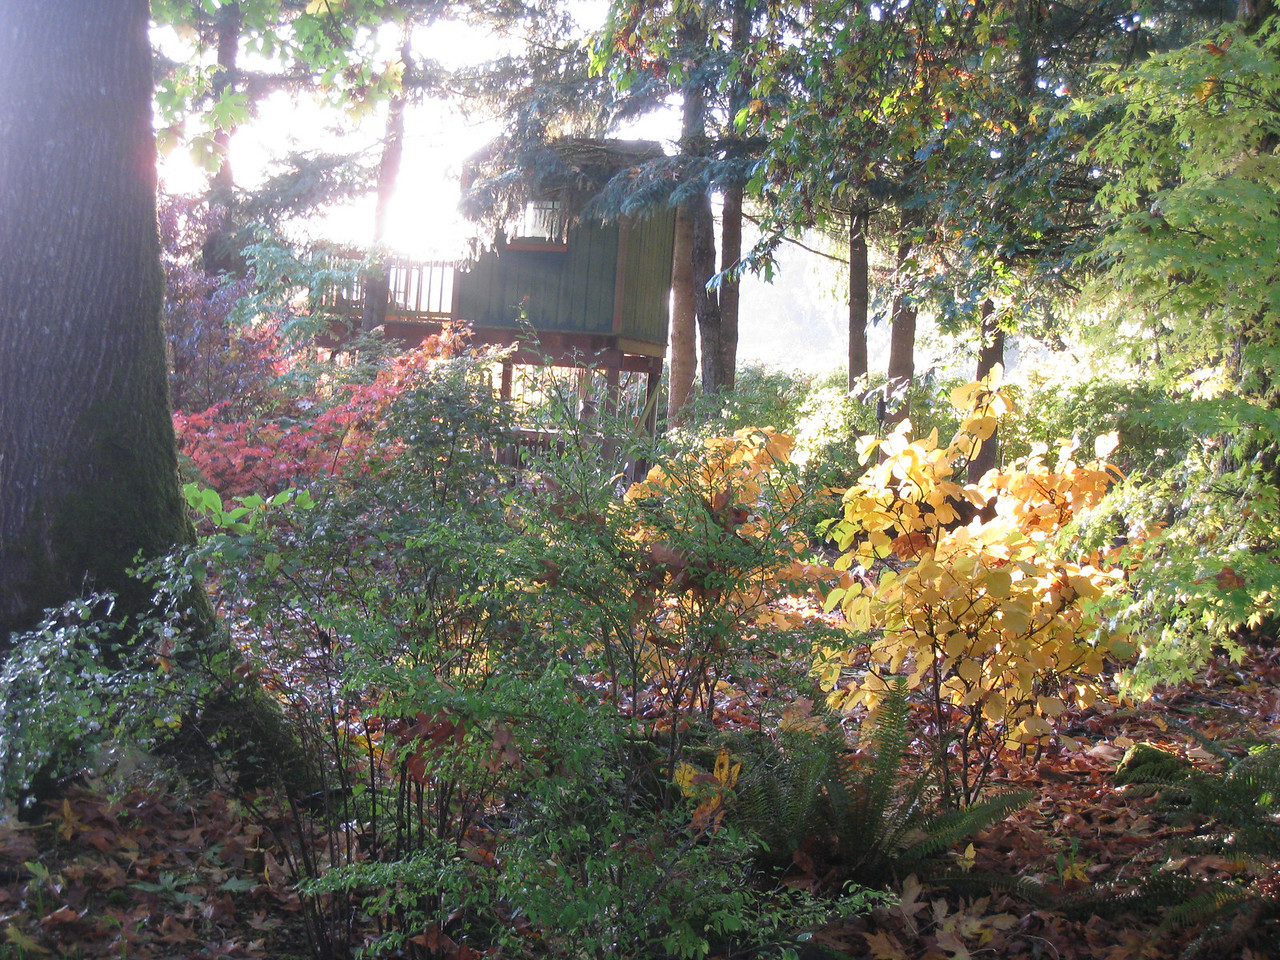 The Back garden in Early November.